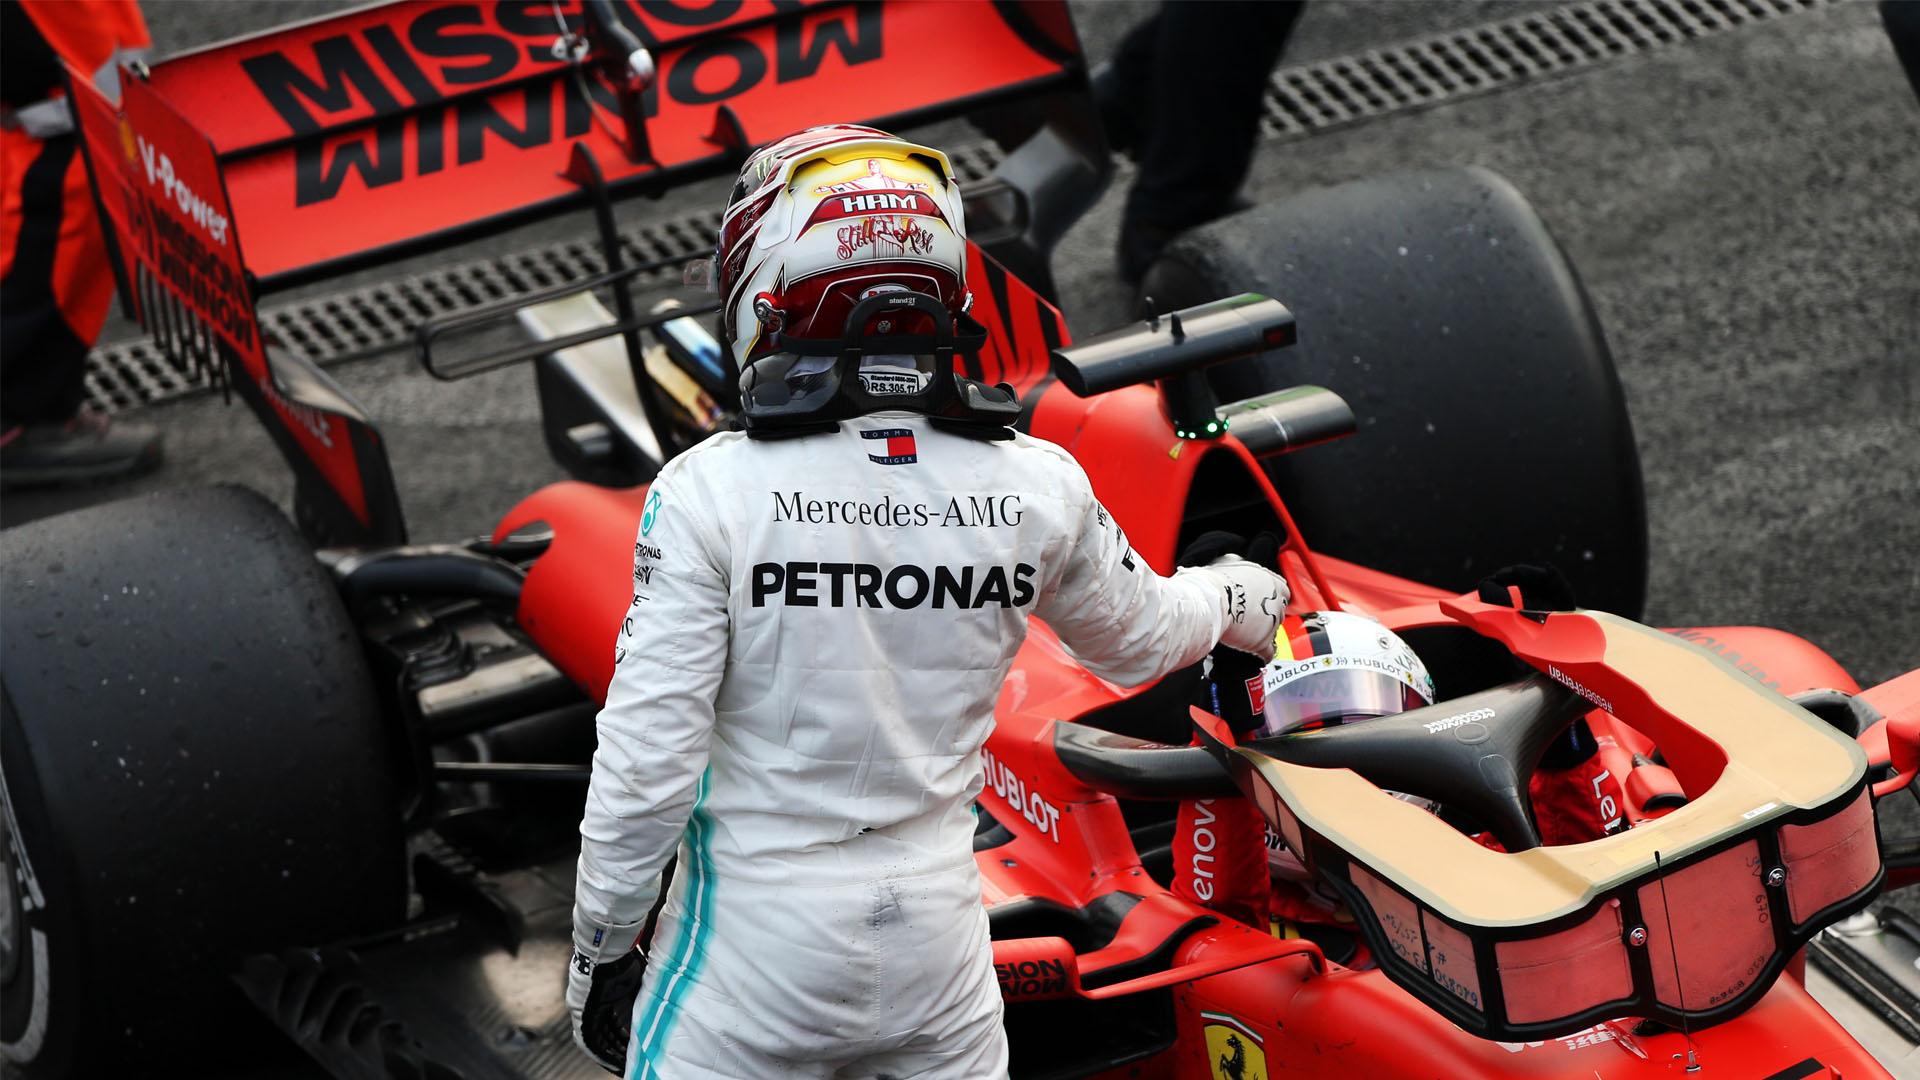 Lewis Hamilton to Ferrari for 2021   Could Ferrari sign Mercedes 1920x1080